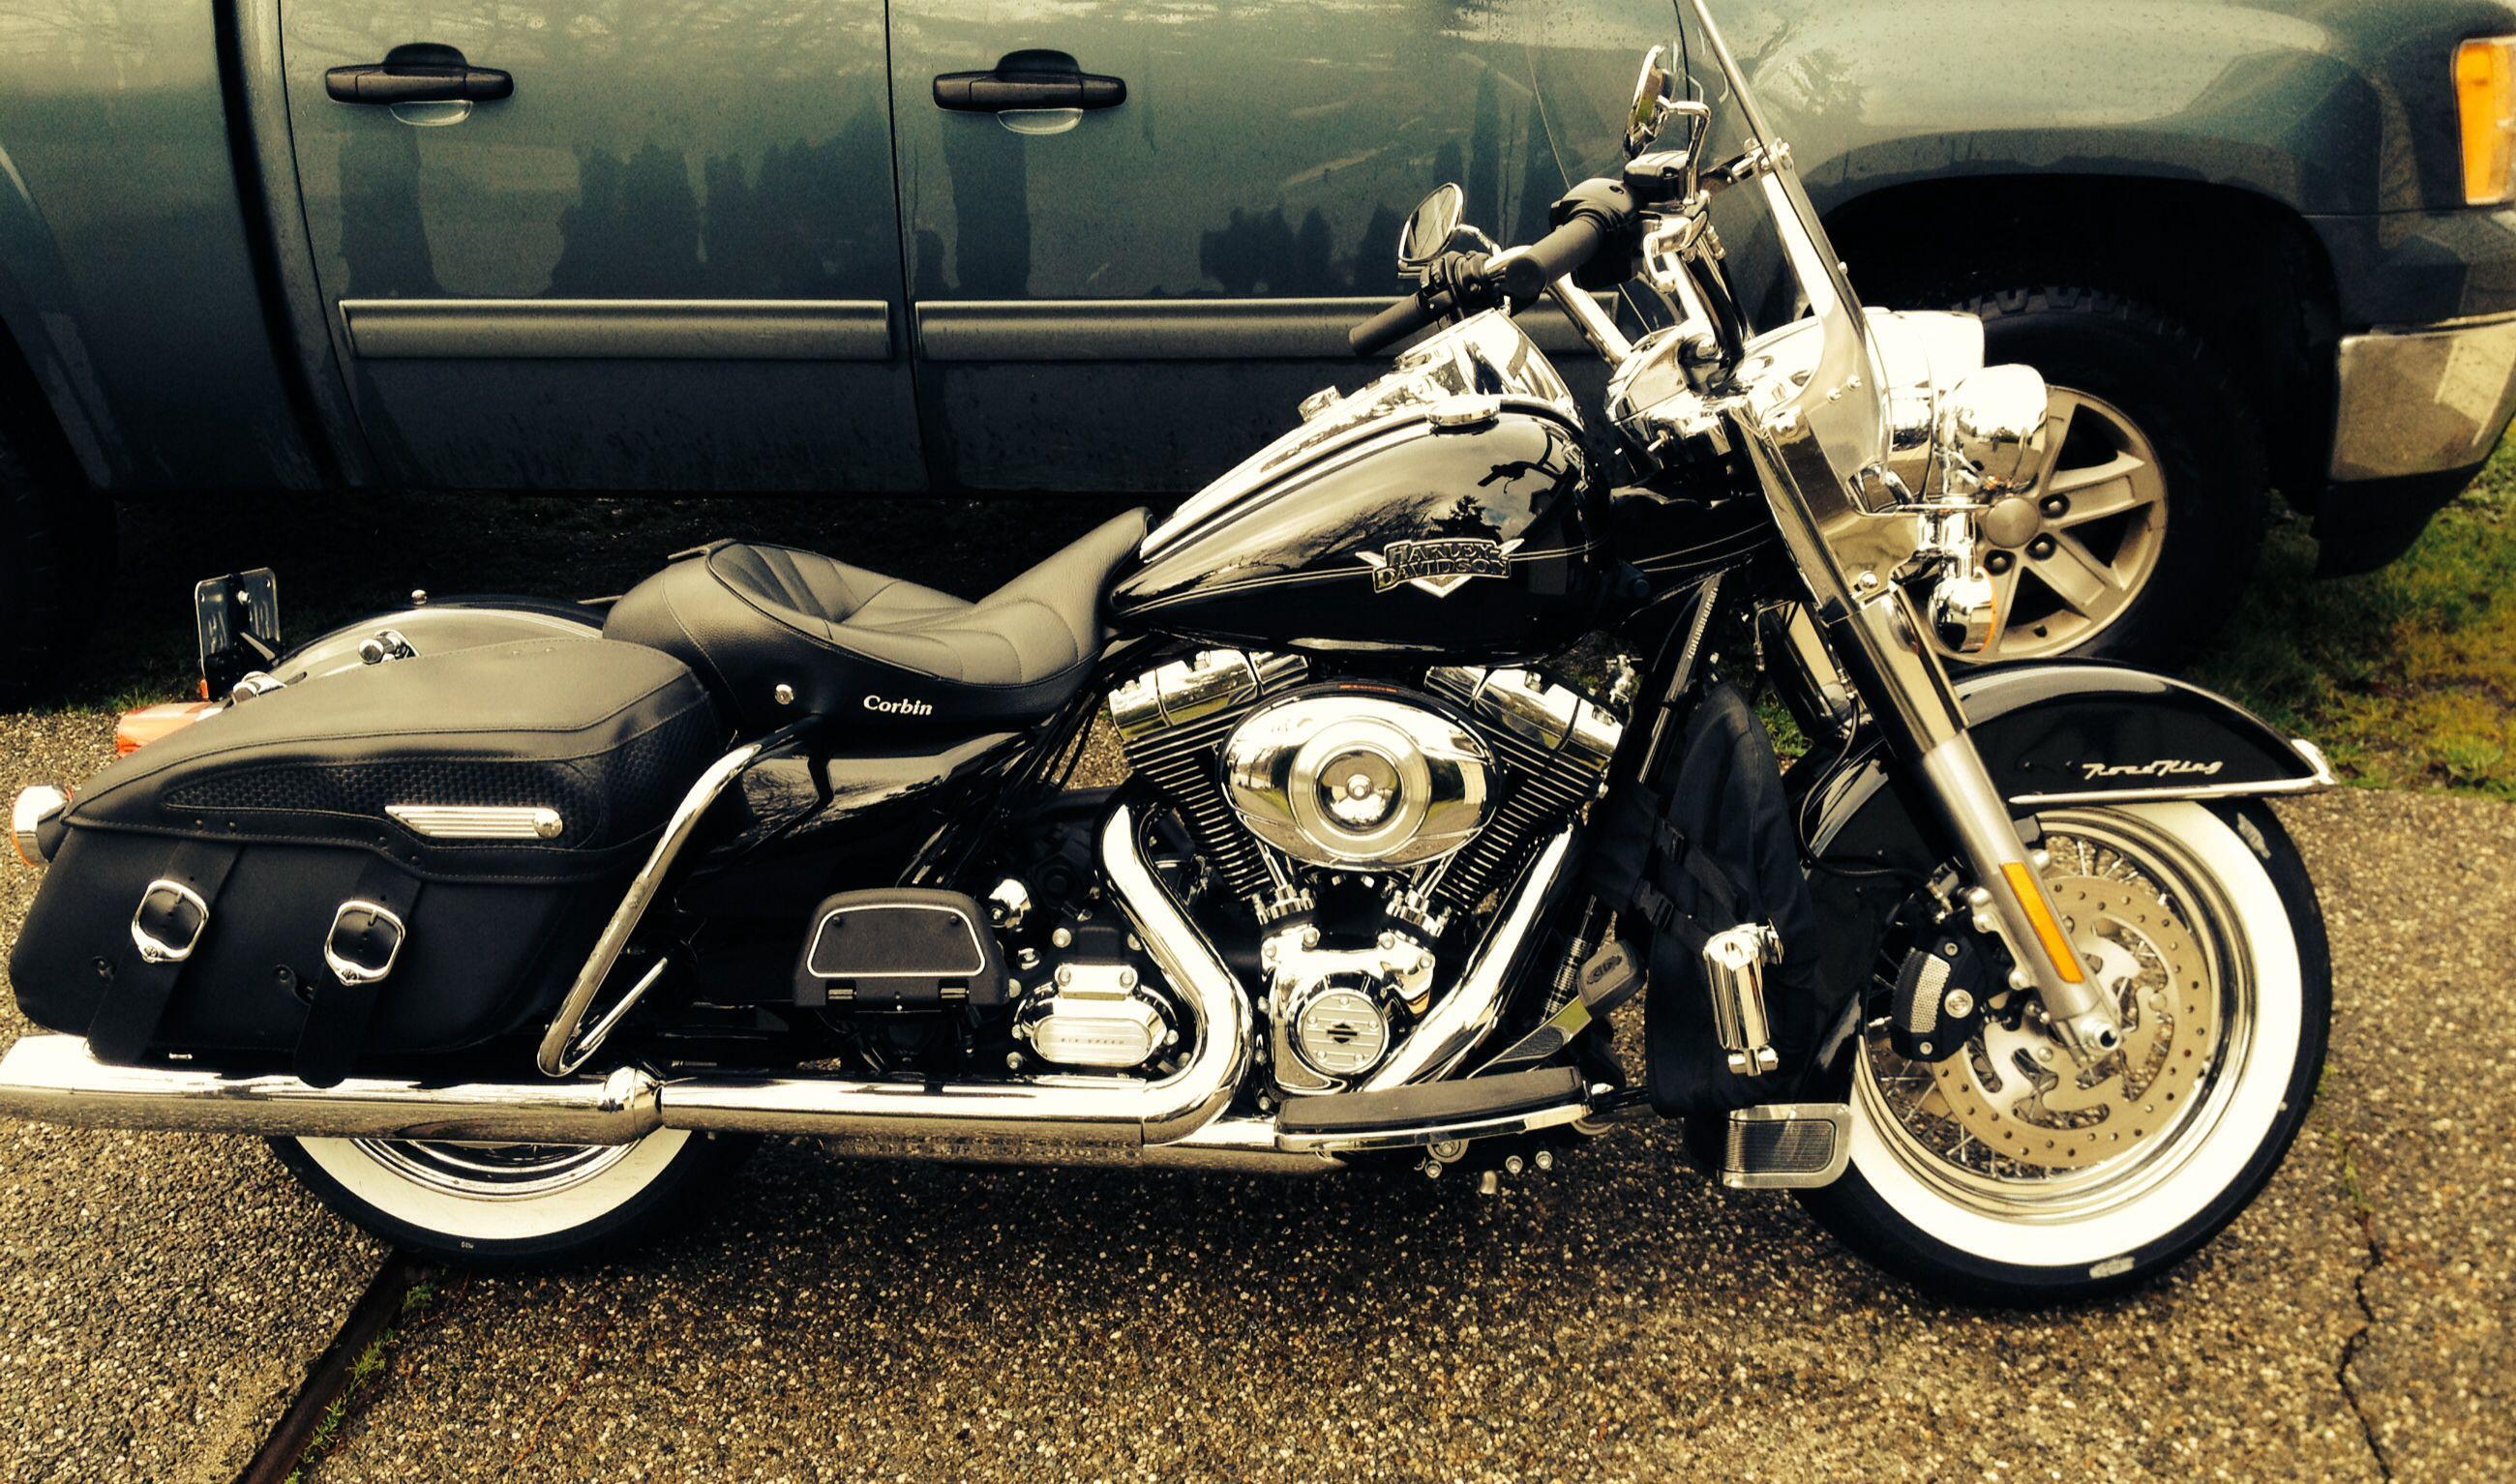 Pin By Byungsukim On Motorcycle Road King Classic Harley Bikes Harley Davidson